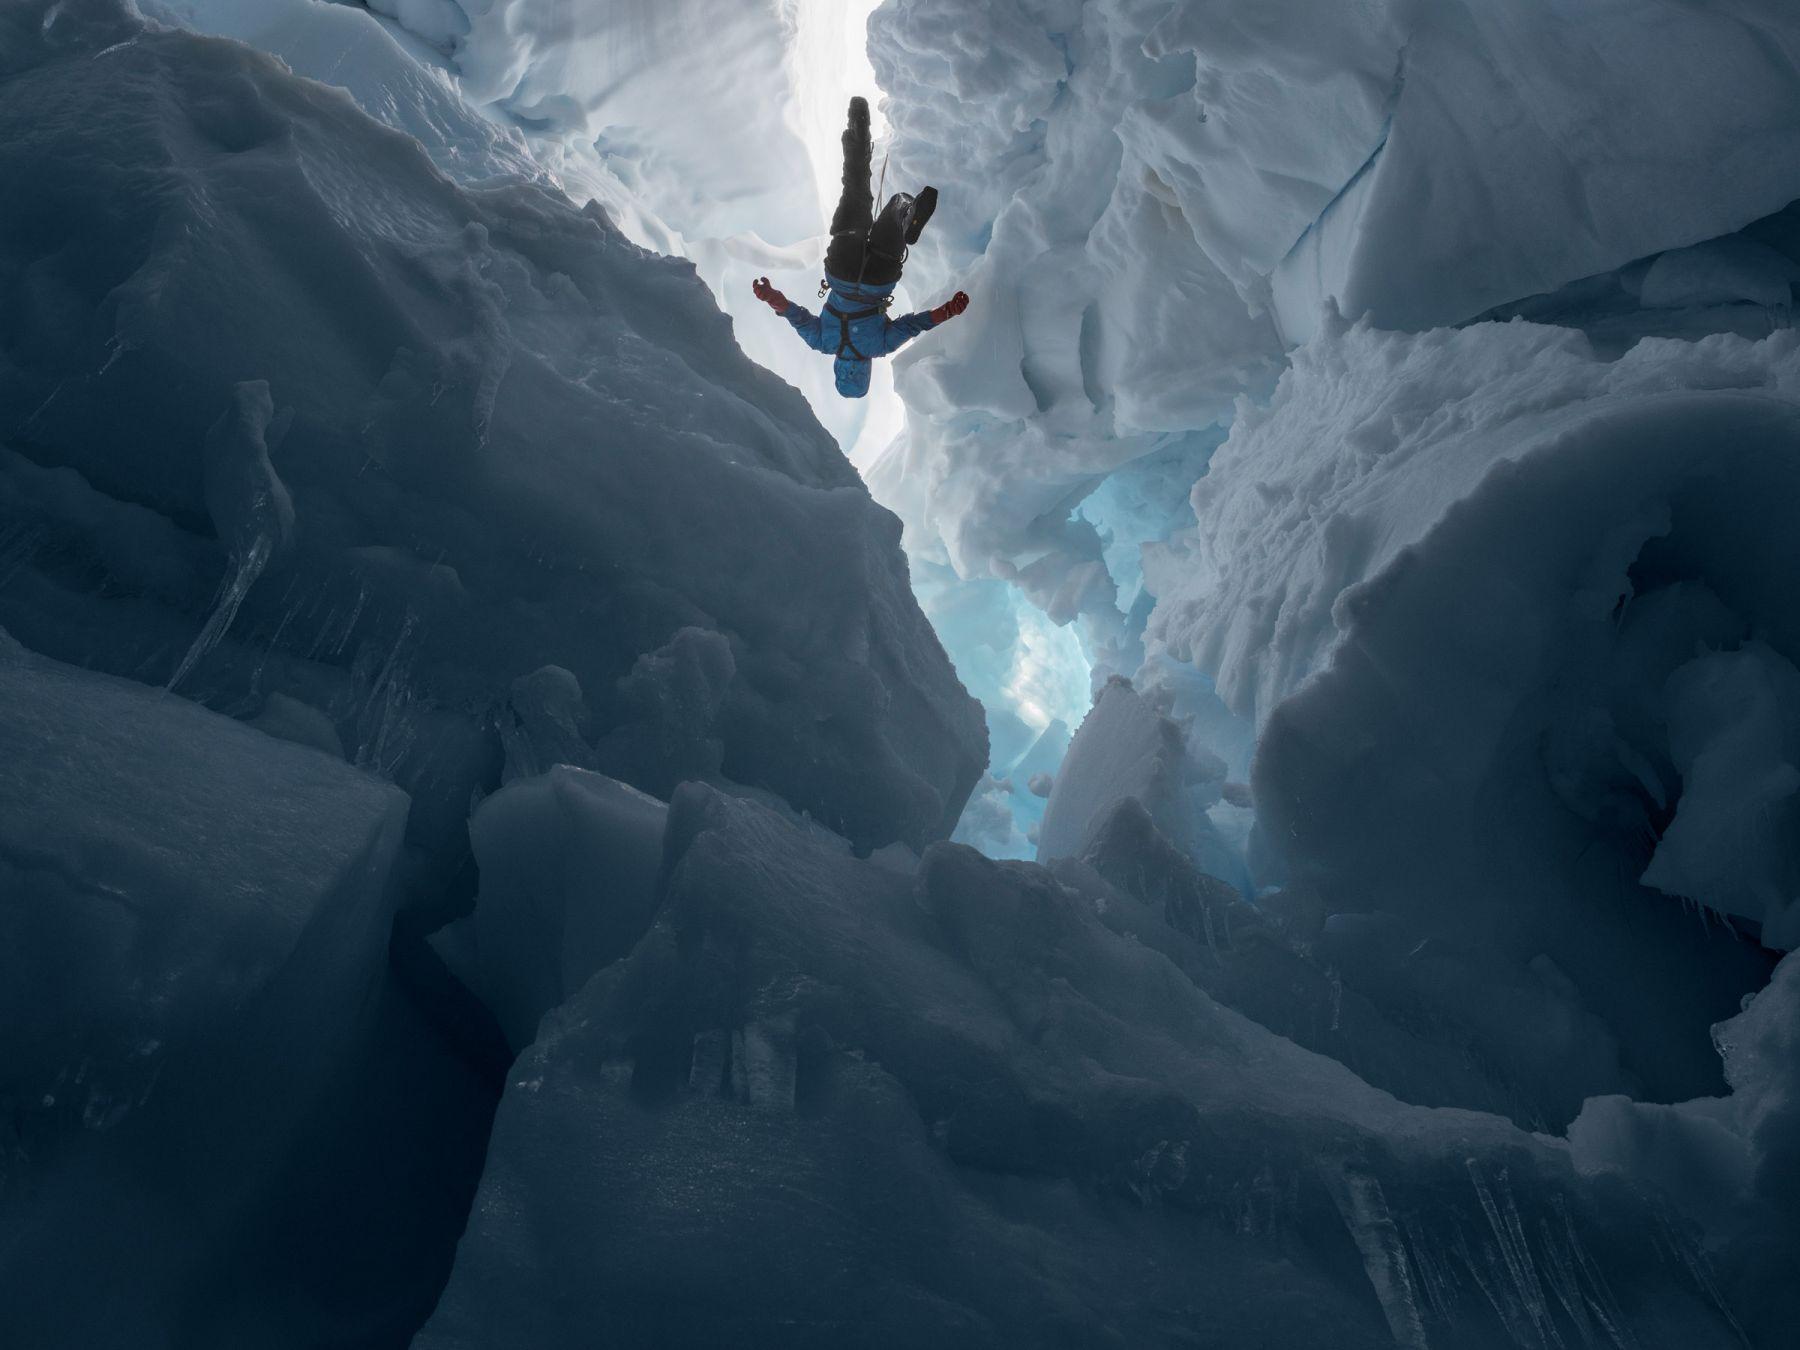 LUCAS FOGLIAKenzie inside a Melting Glacier, Juneau Icefield Research Program, Alaska, 2016